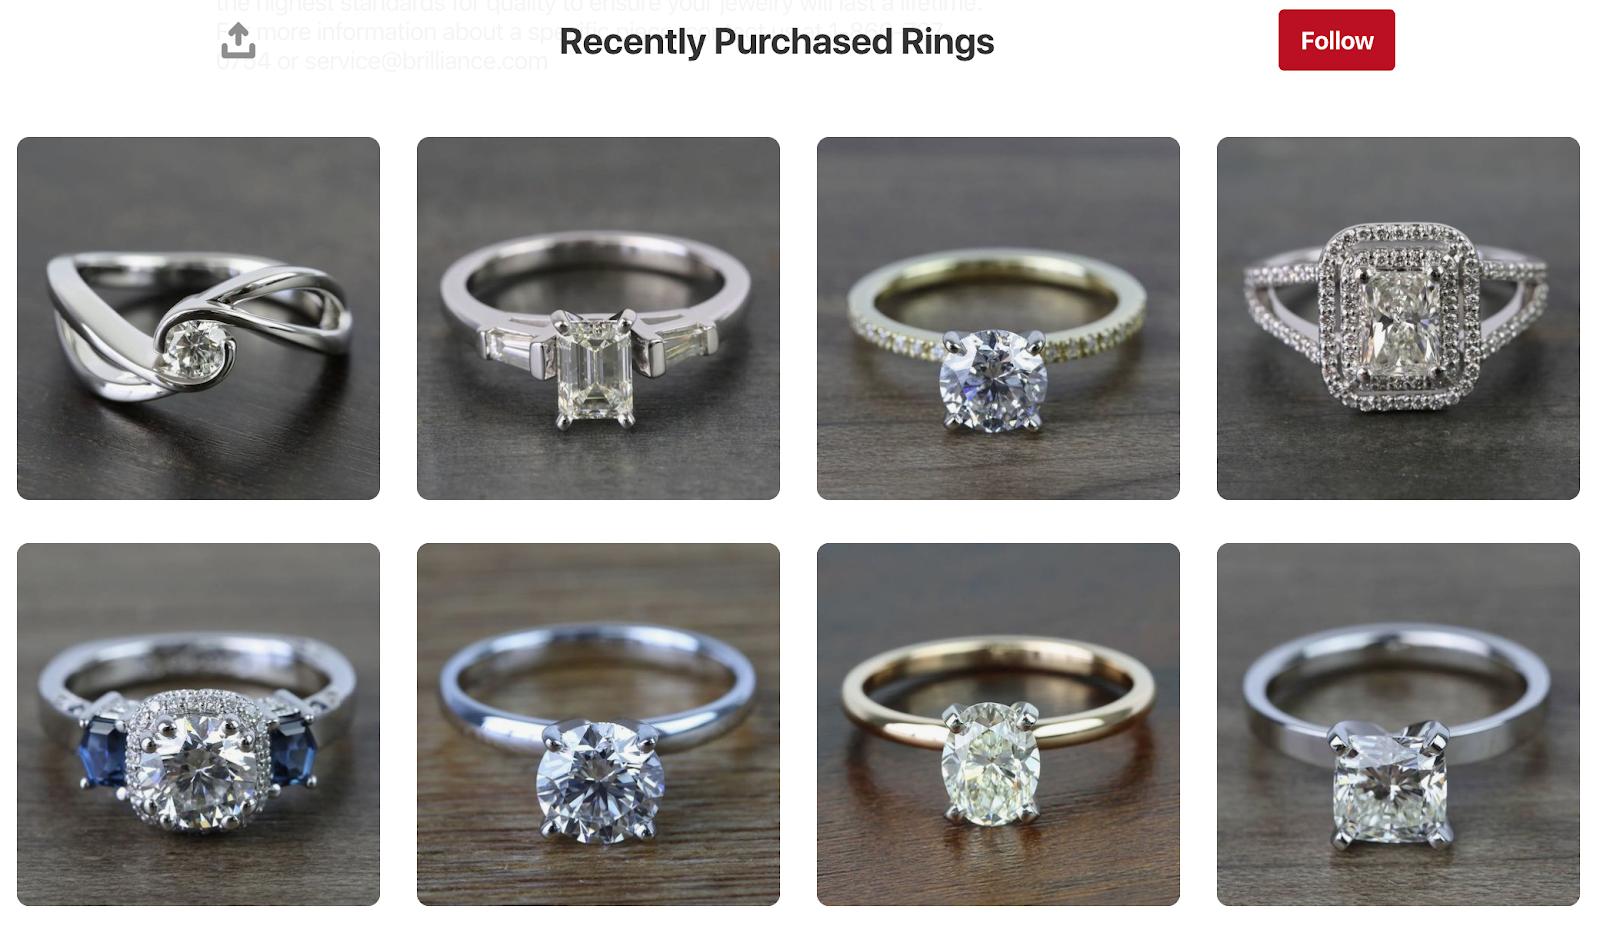 Screenshot showing jewelry catalog